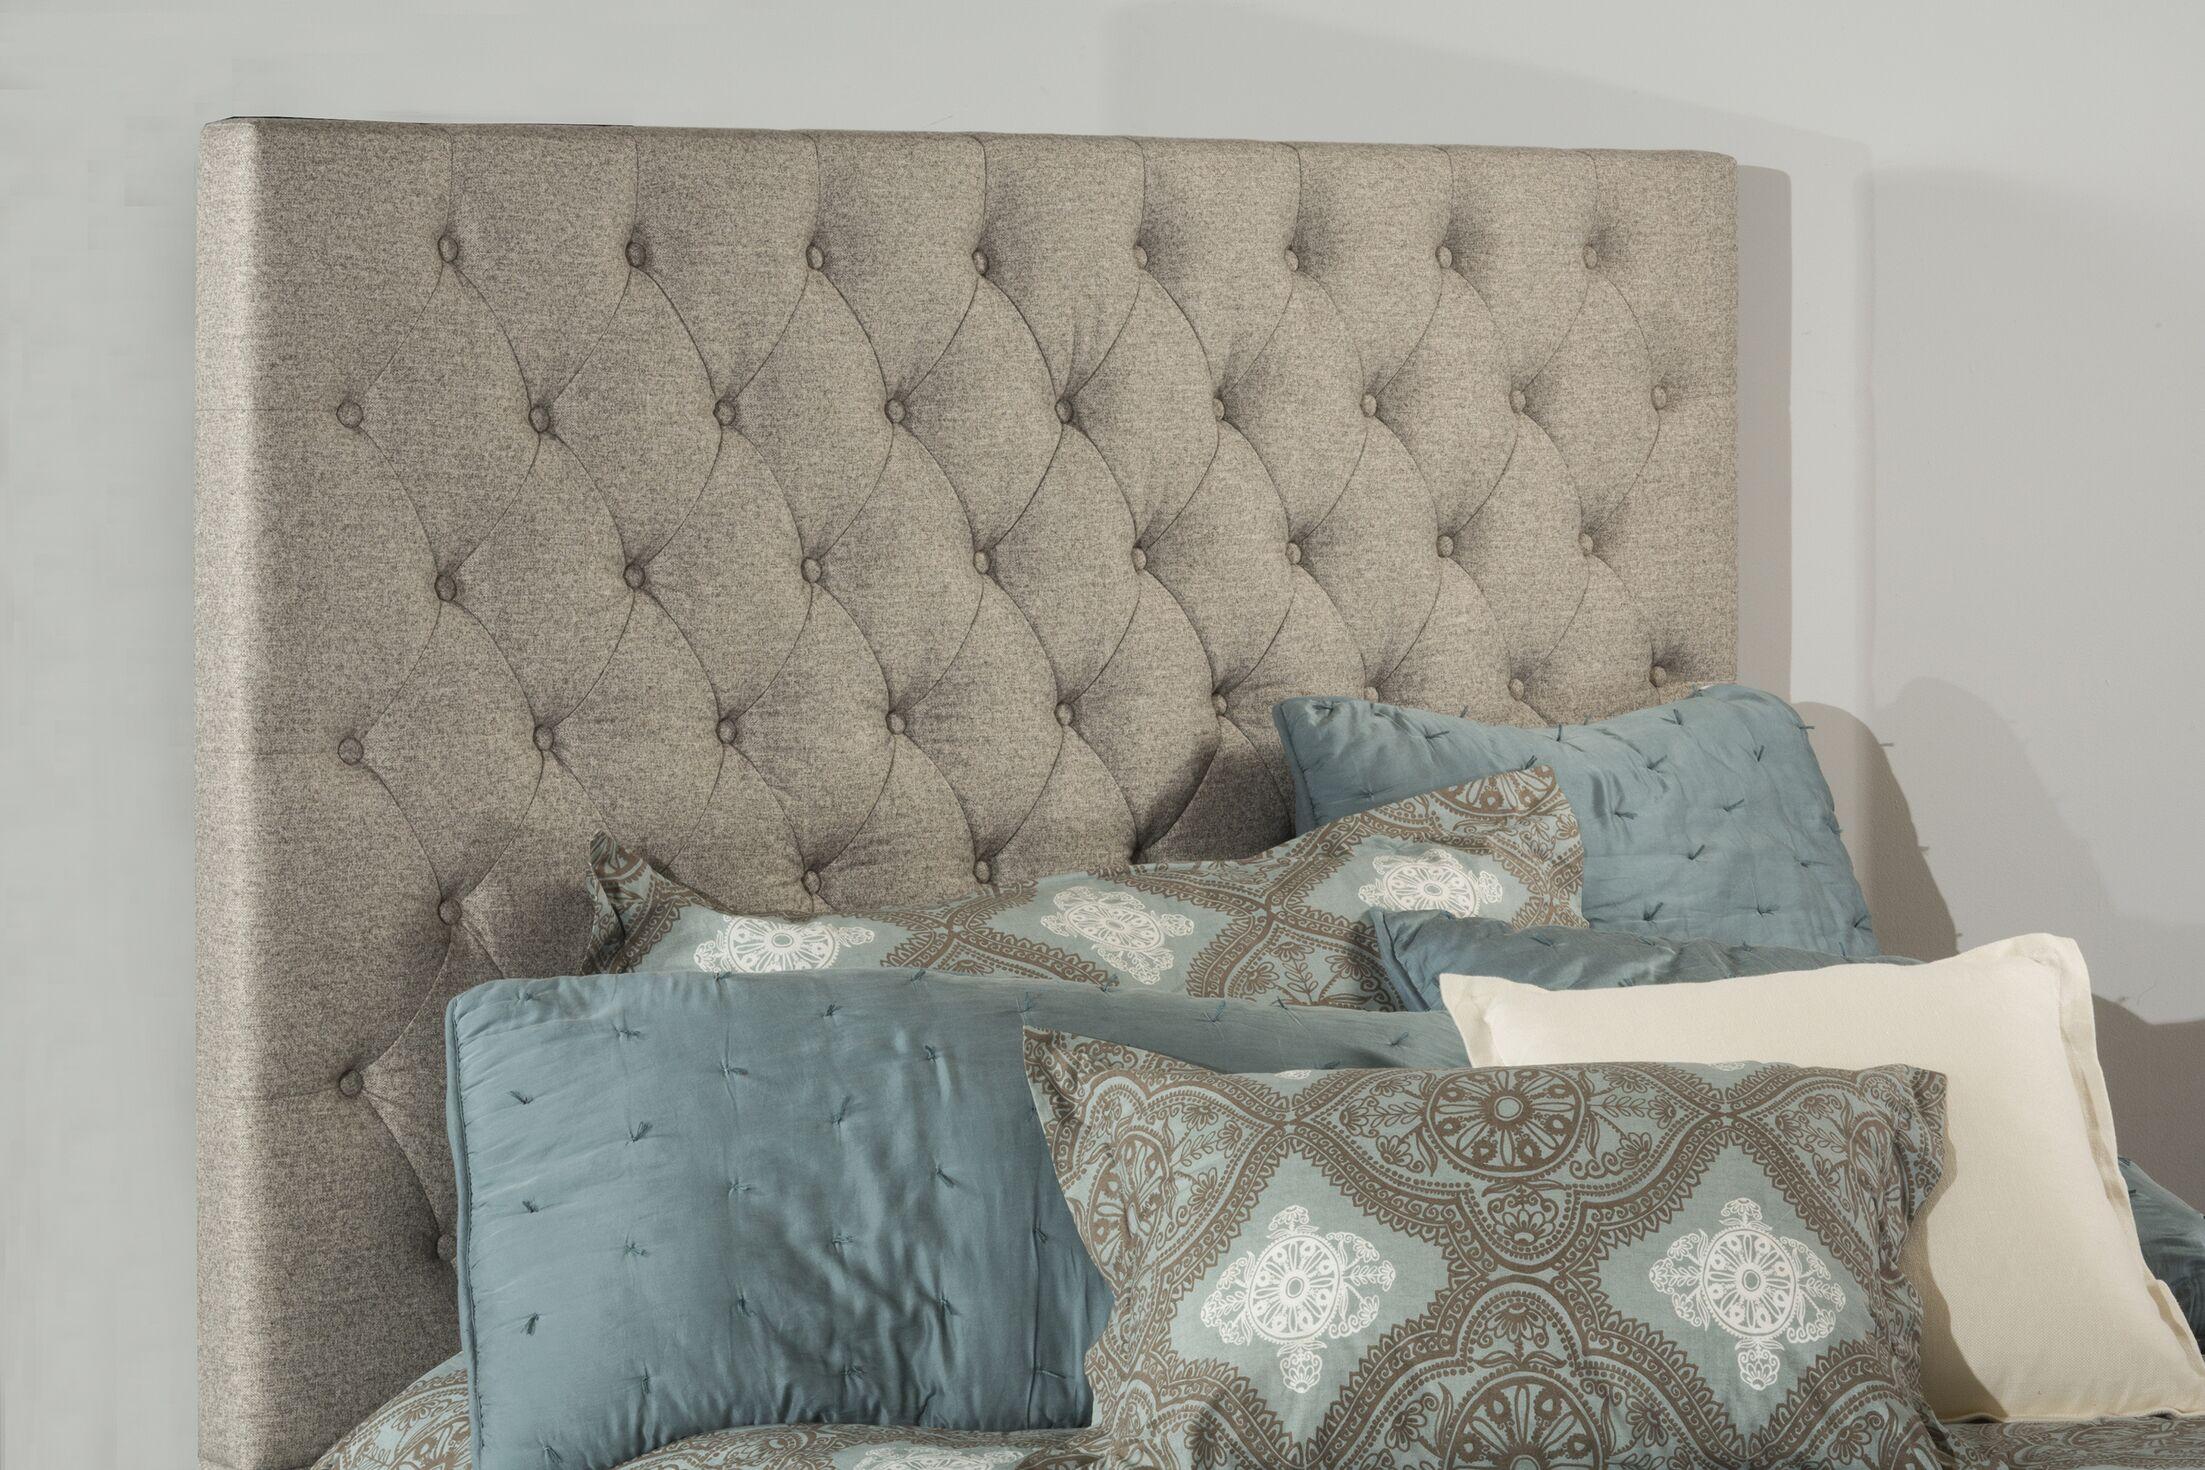 Keesee Upholstered Panel Headboard Size: King, Color: Beige